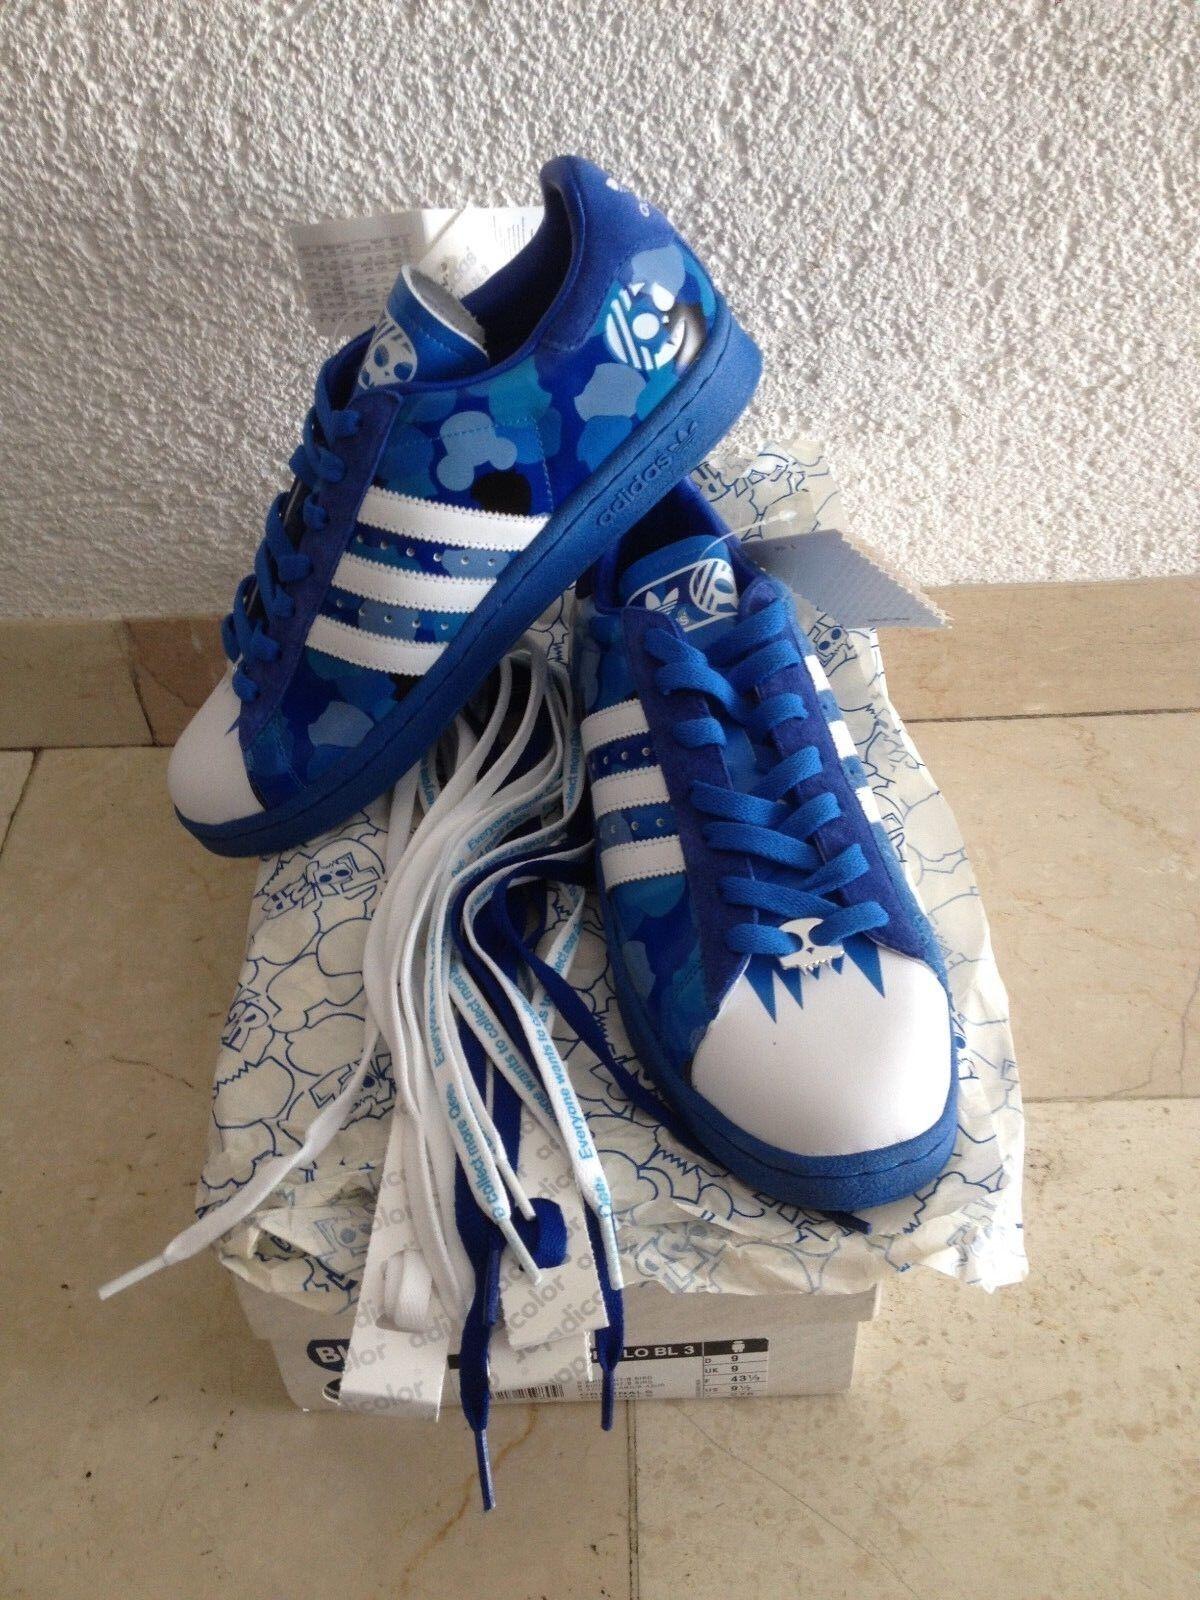 Adidas adiFarbe CENTURY LO BL3  43 UK 9 US 9.5 BNWT 562892 prod. 02 06 TOY2R NEU